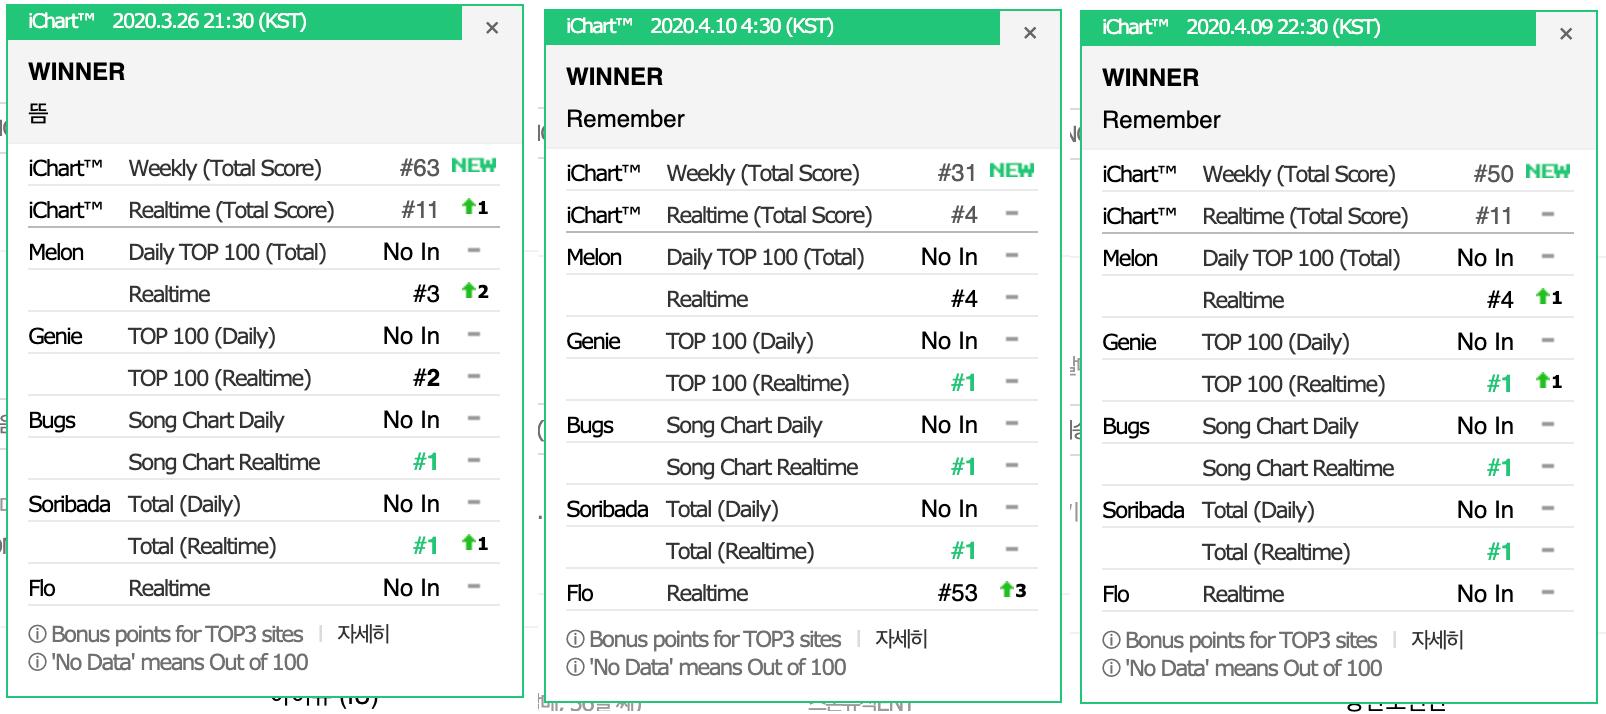 winner_charts-